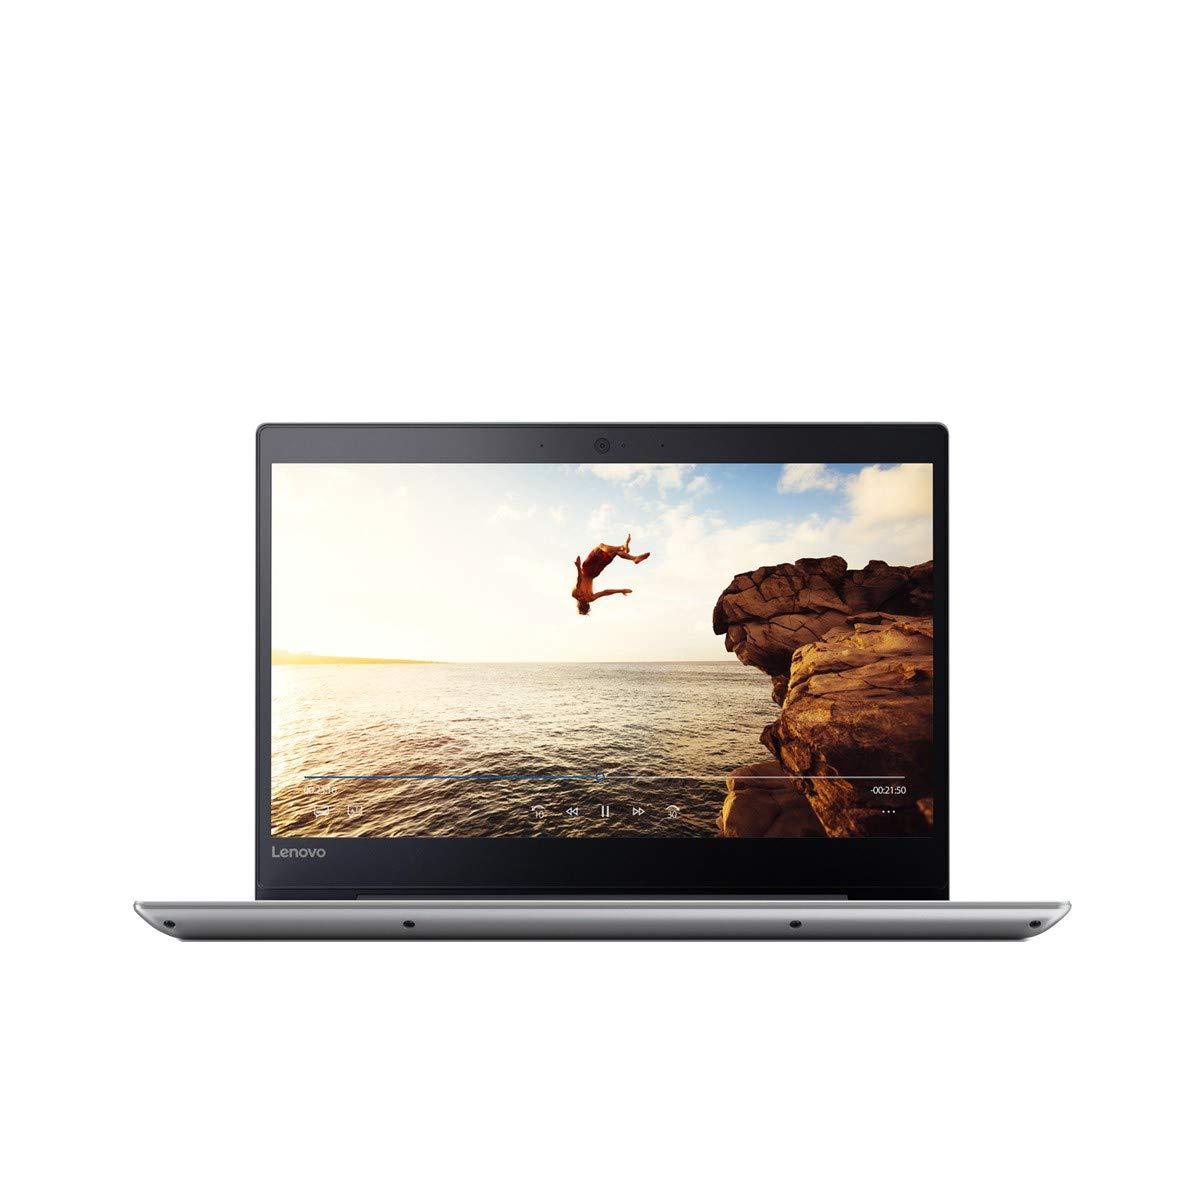 Lenovo Ideapad 320S-14IKB – Ordenador portátil 14″ FullHD (Intel Pentium 4415U, 4GB RAM, 128GB SSD, Intel HD Graphics, Windows 10) gris – Teclado QWERTY español